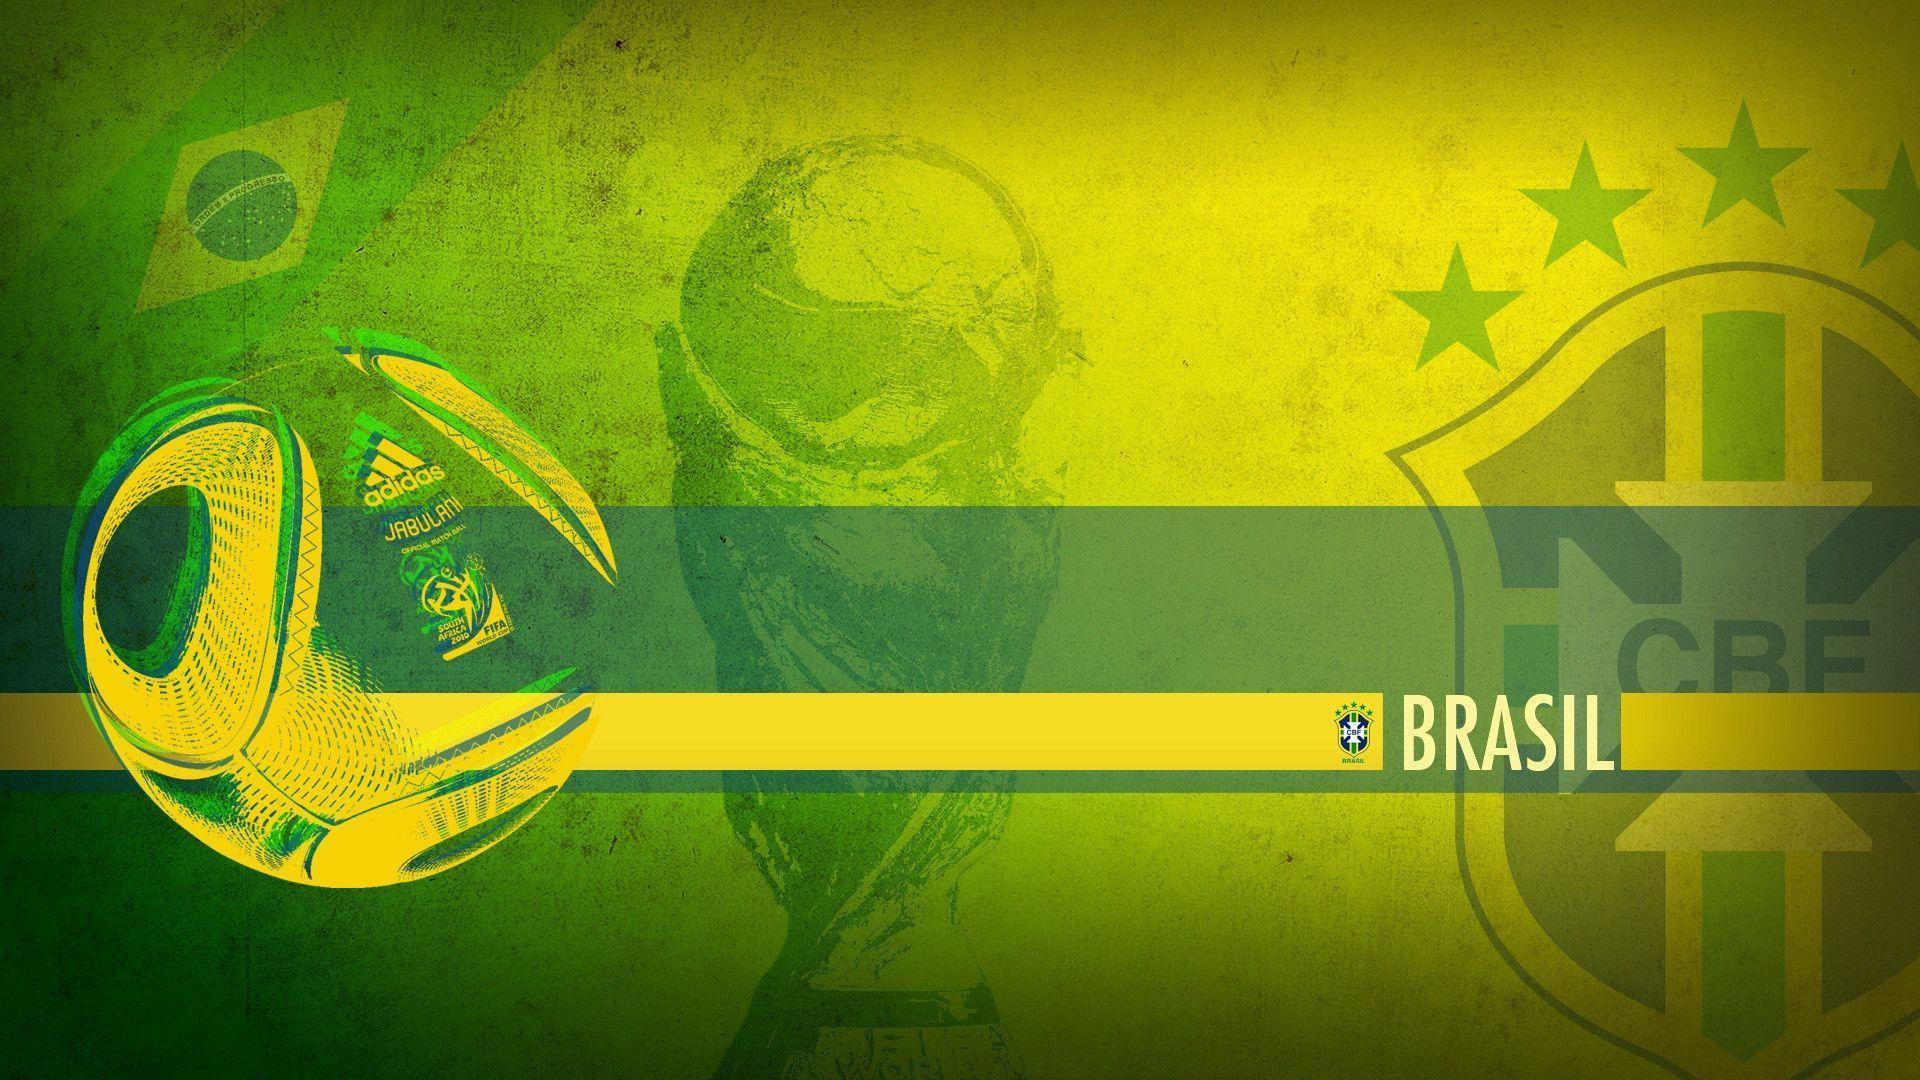 Most Beautiful 4k Brazil Soccer Wallpapers For Desktop, - World Cup Brazil Background , HD Wallpaper & Backgrounds